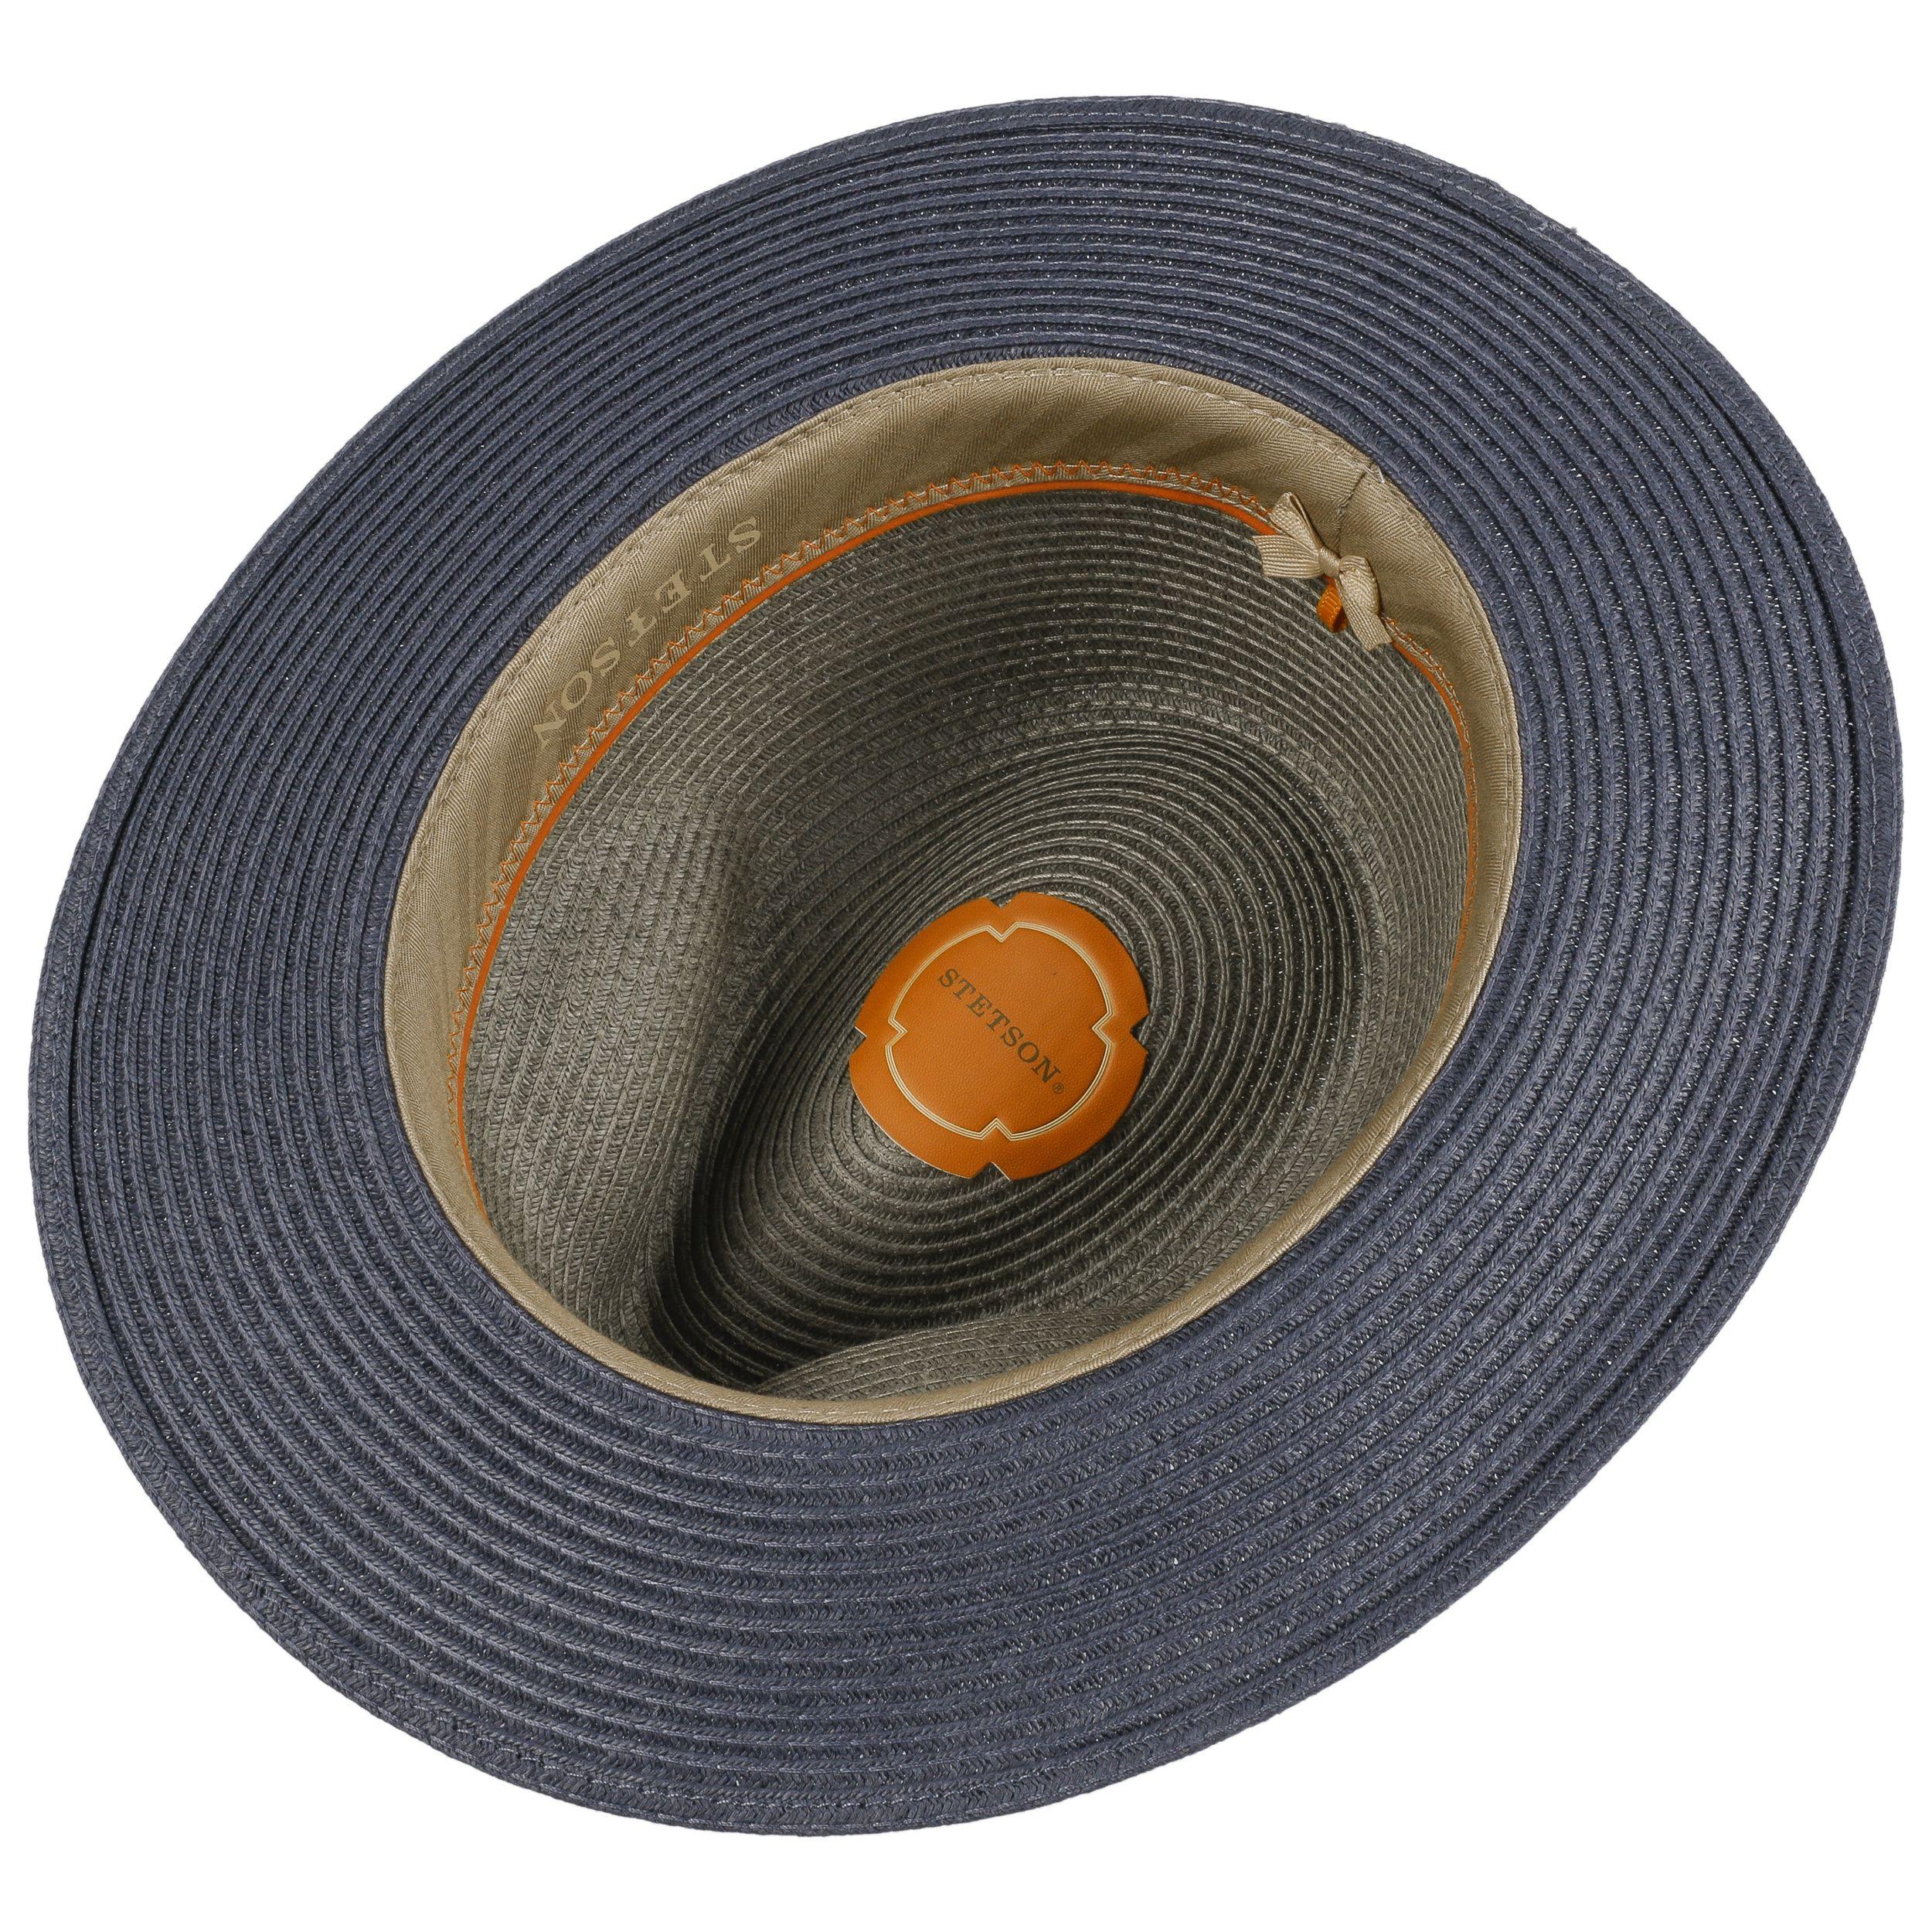 Chapeau en Paille Romaro Toyo gris